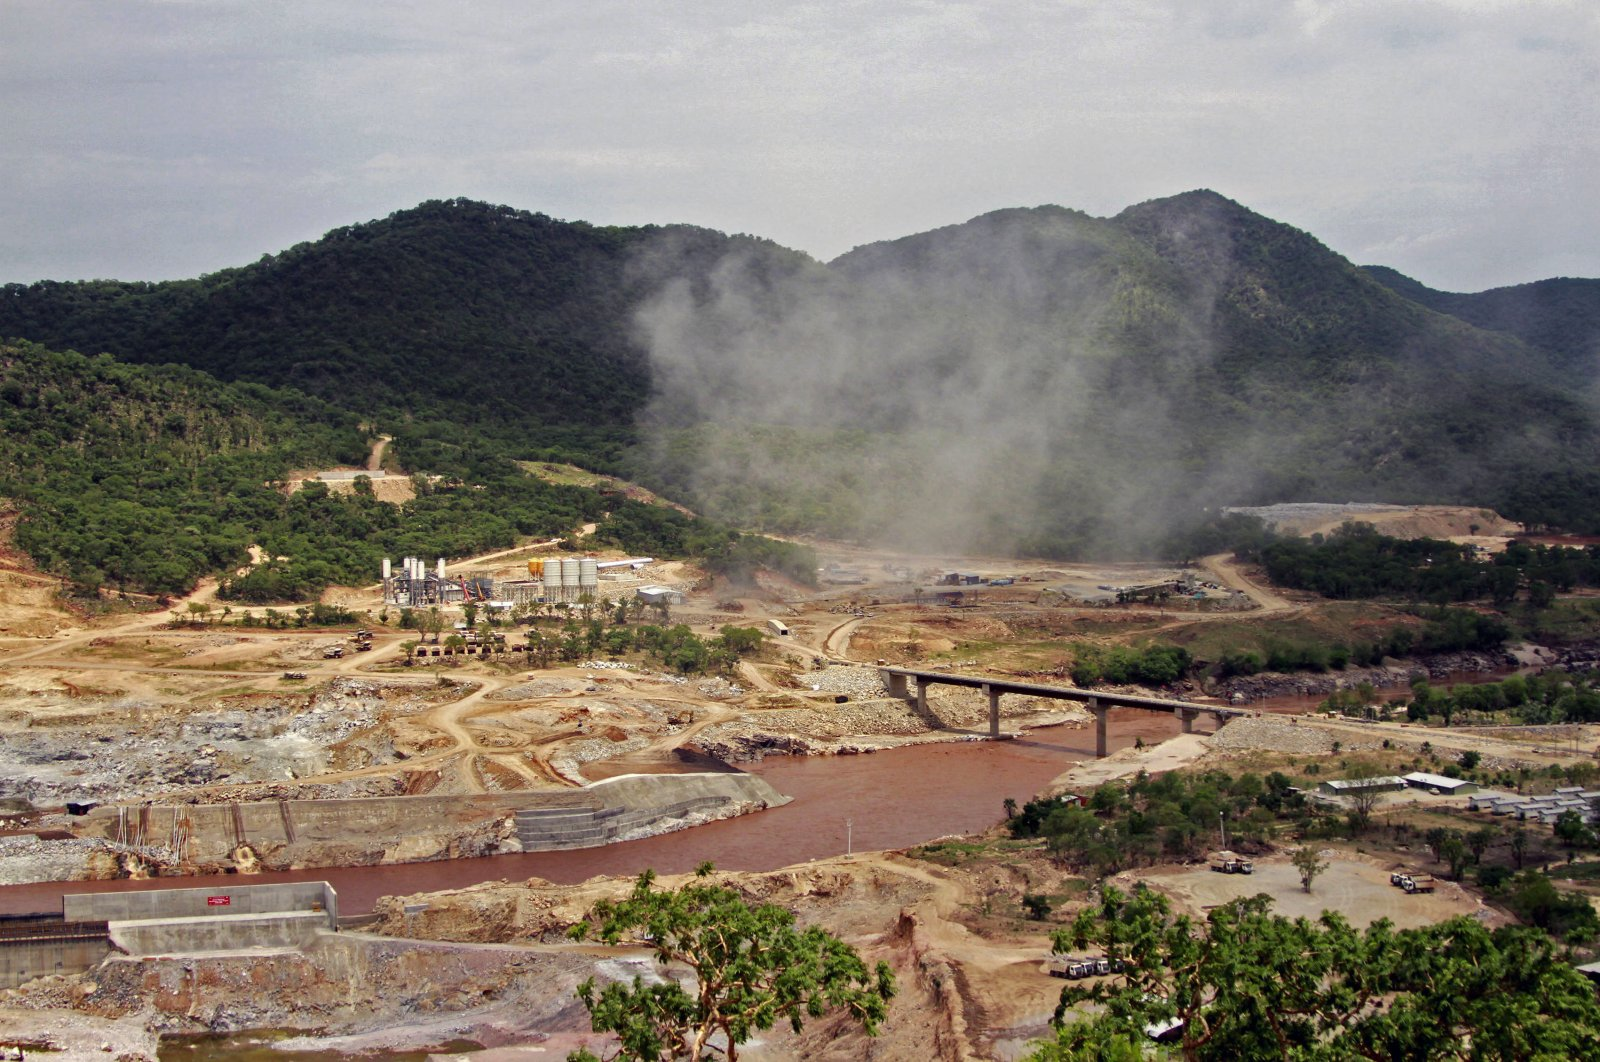 The Blue Nile river flows near the site of the planned Grand Ethiopian Renaissance Dam near Assosa in the Benishangul-Gumuz region of Ethiopia, near Sudan, some 800 kilometers (500 miles) from the capital Addis Ababa, June 28, 2013. (AP Photo)